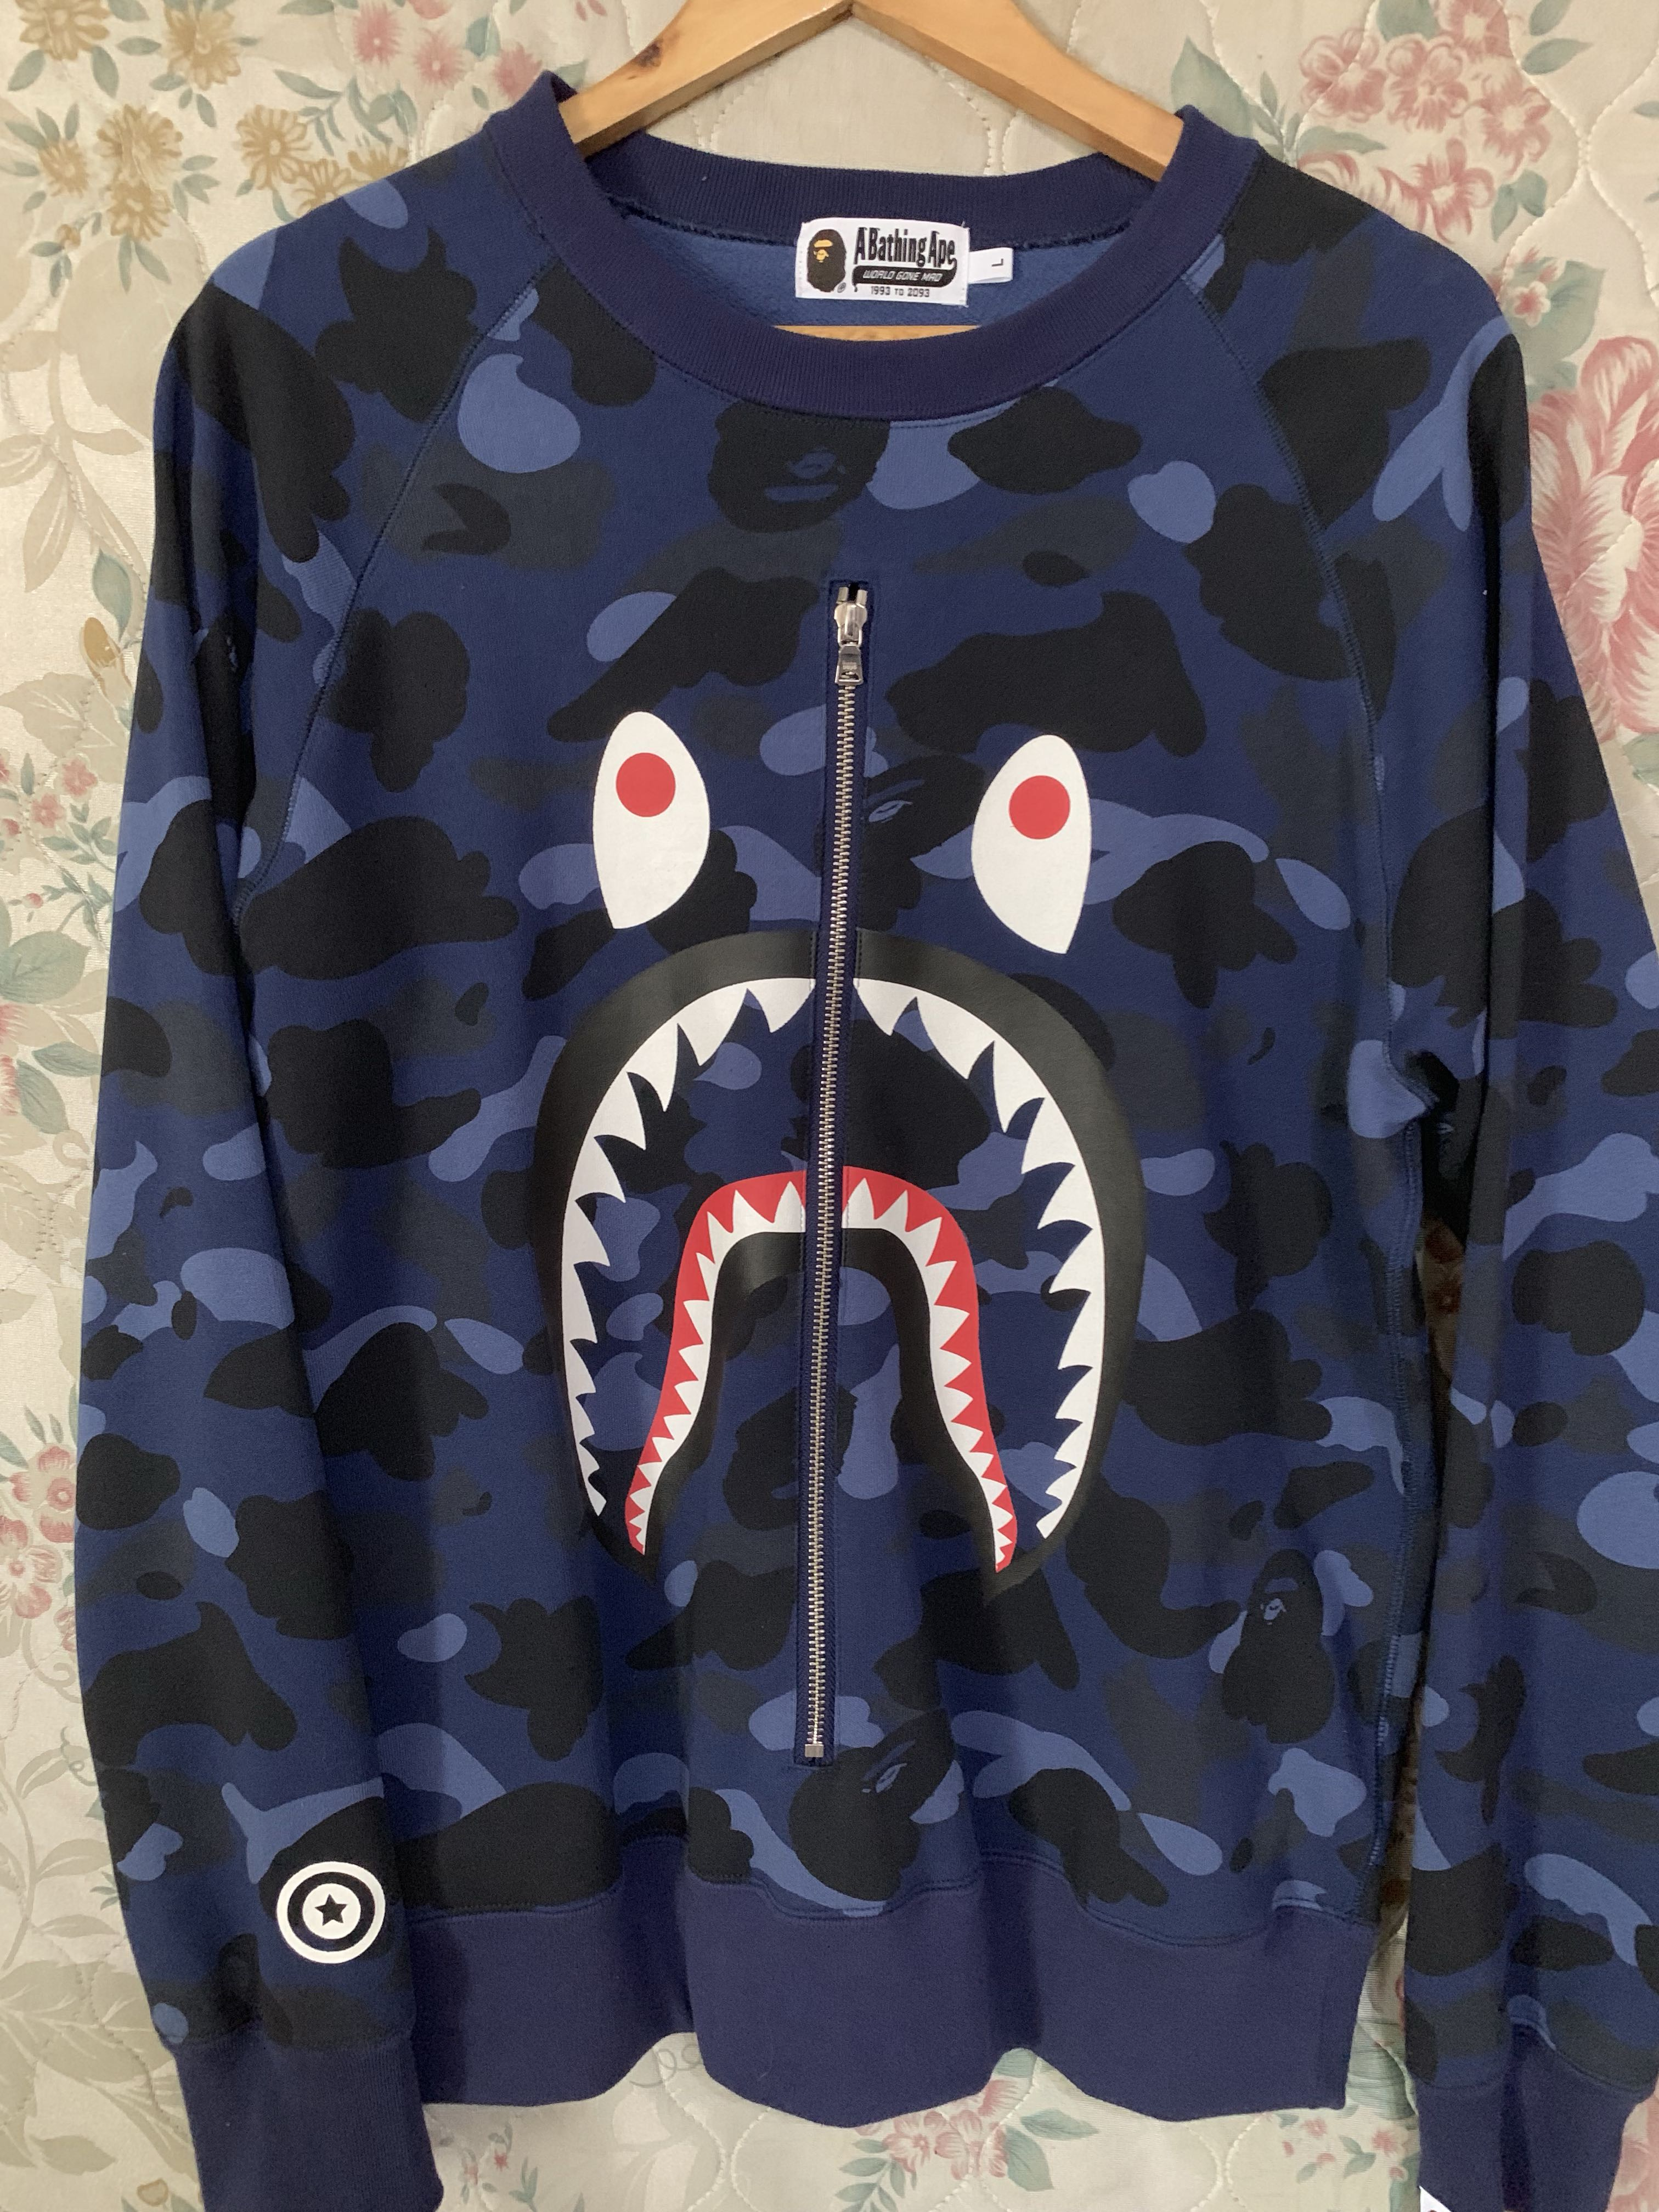 79af5fbe787c BAPE Color Camo Shark Crewneck